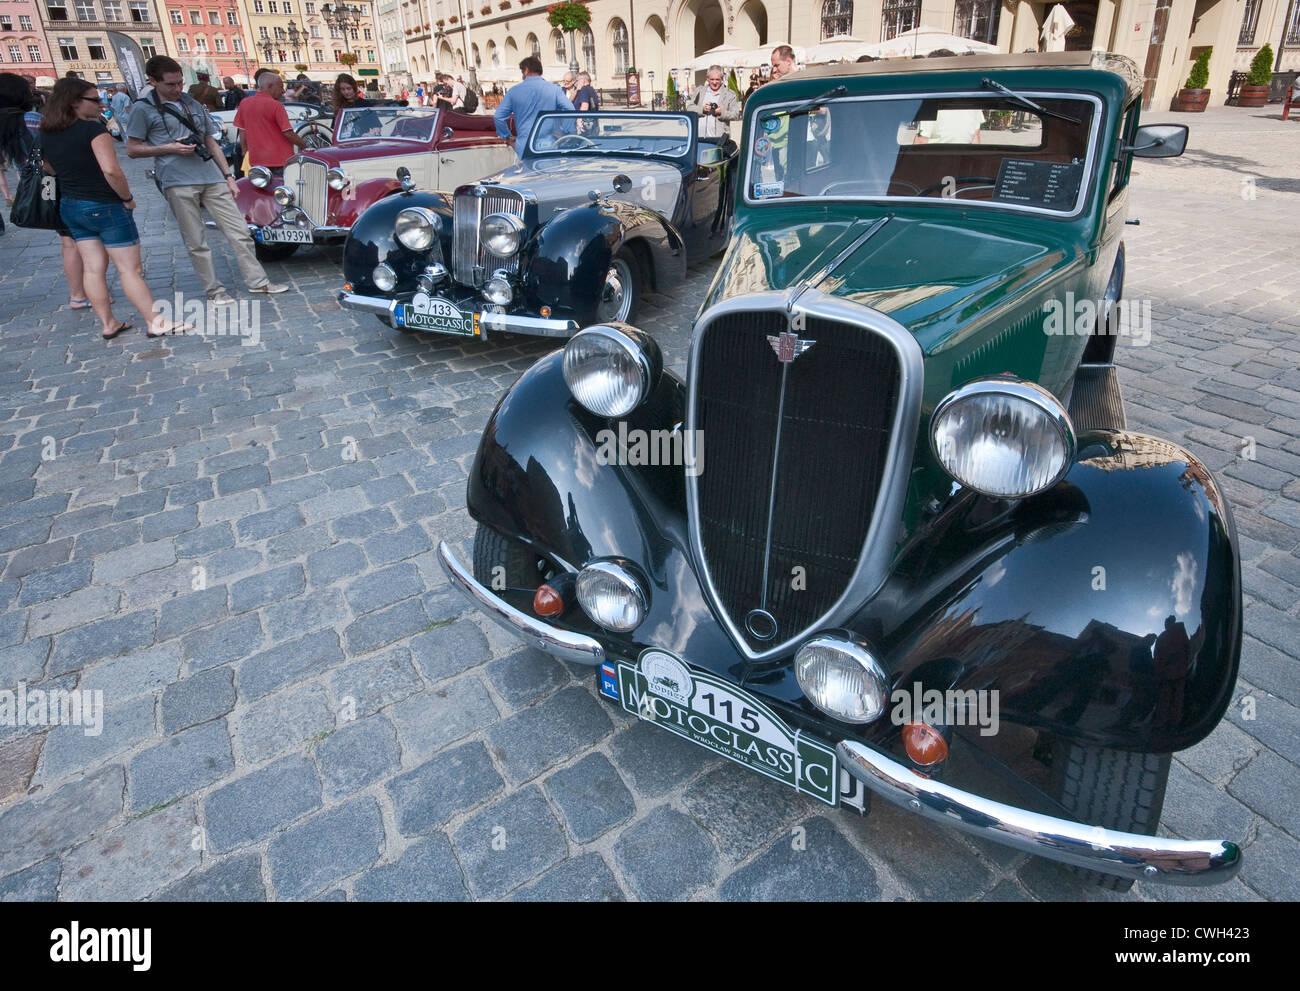 Polski Fiat Iii A Motoclassic Car Show Al Rynek Piazza Del - Mercato car show